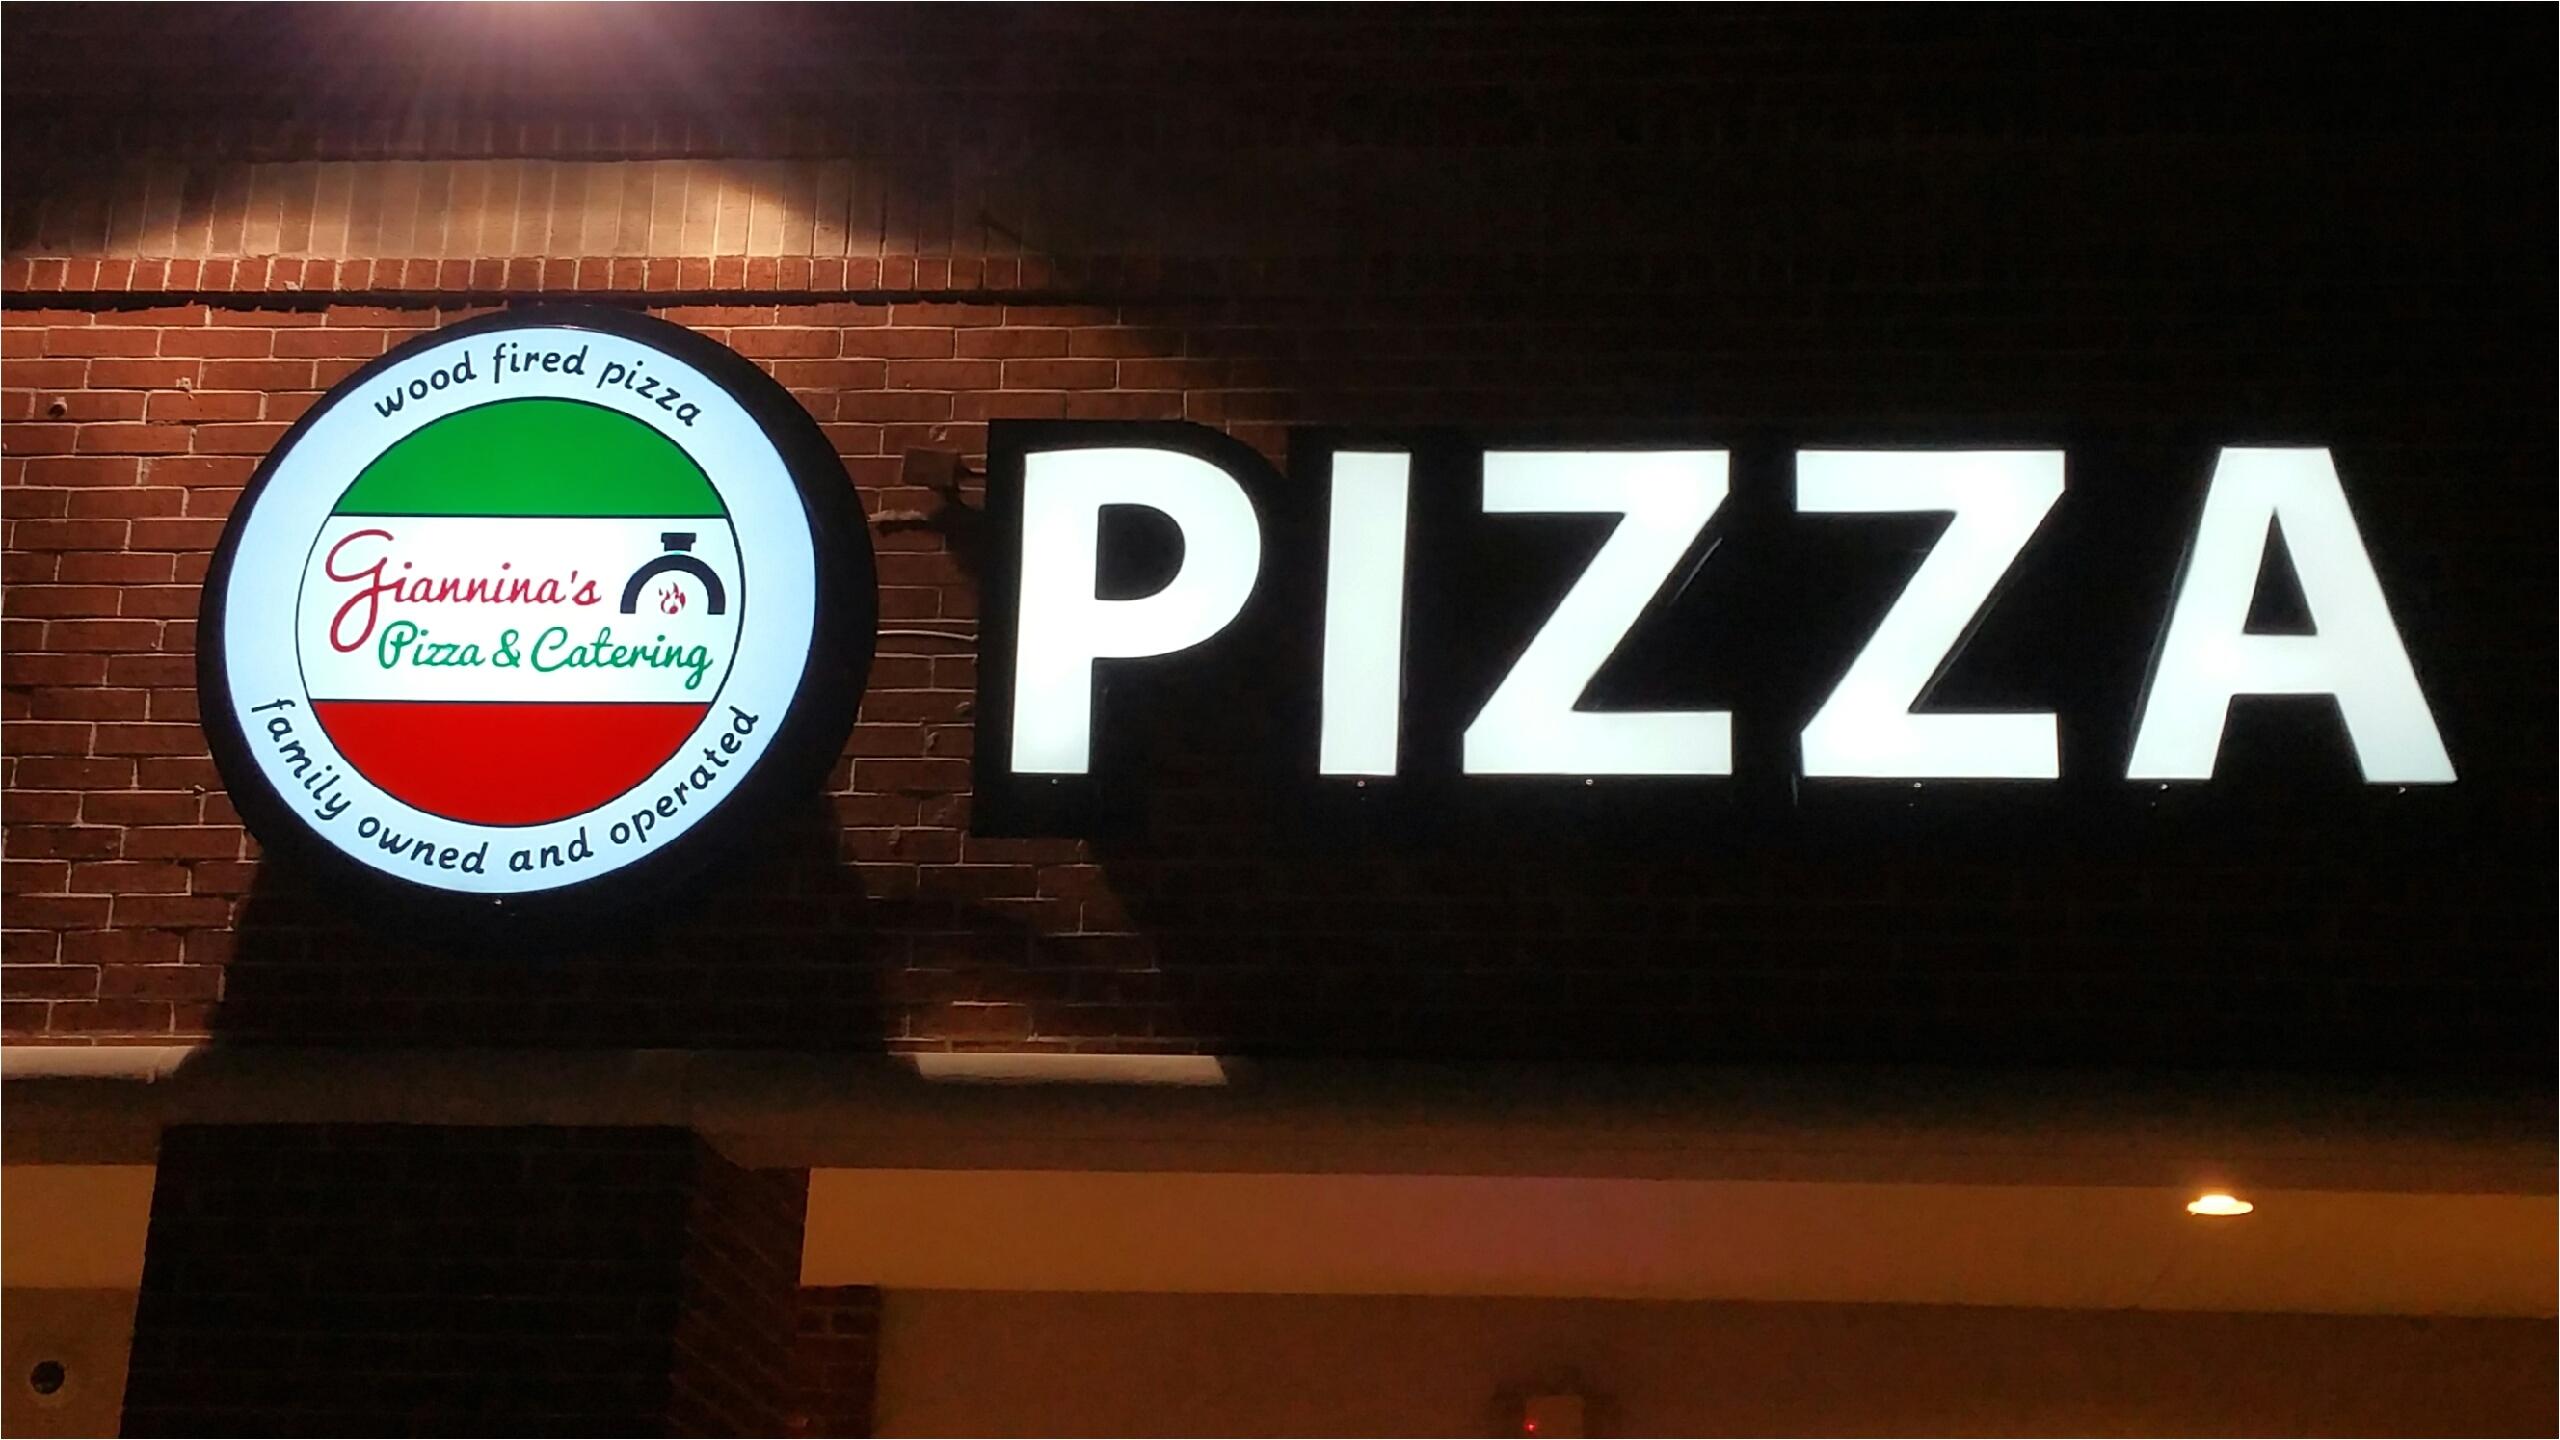 restaurant gianninas pizza cypress tx lighted sign